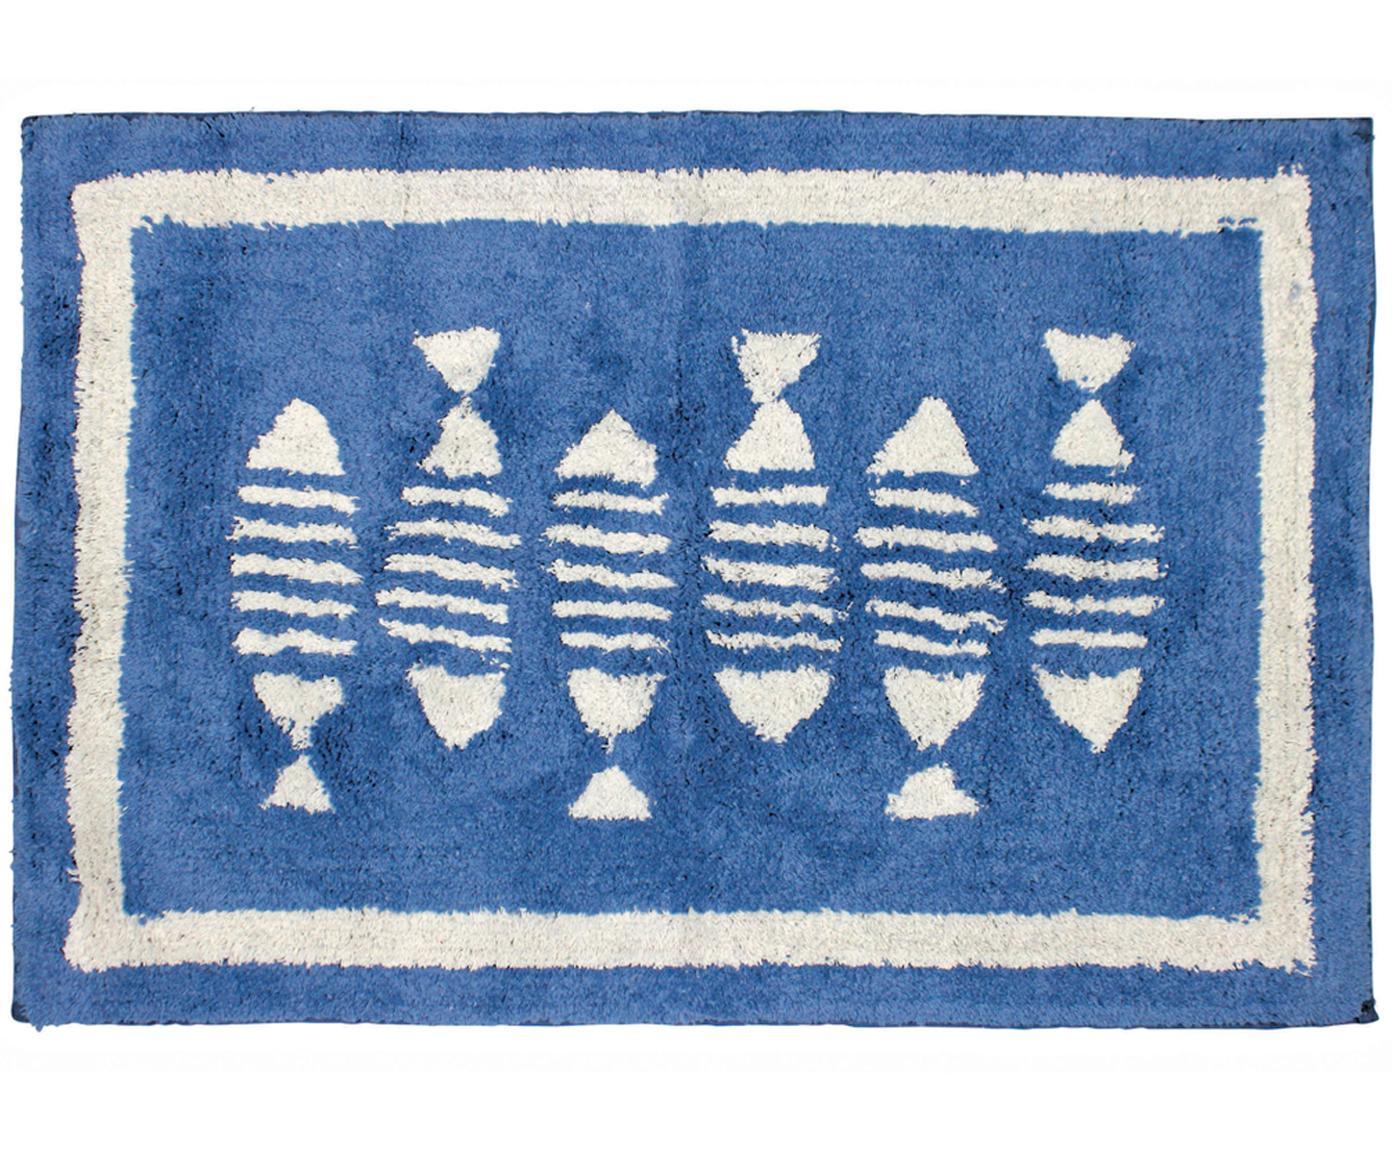 Badvorleger Summa, 100% Baumwolle, Blau, Weiß, 60 x 90 cm